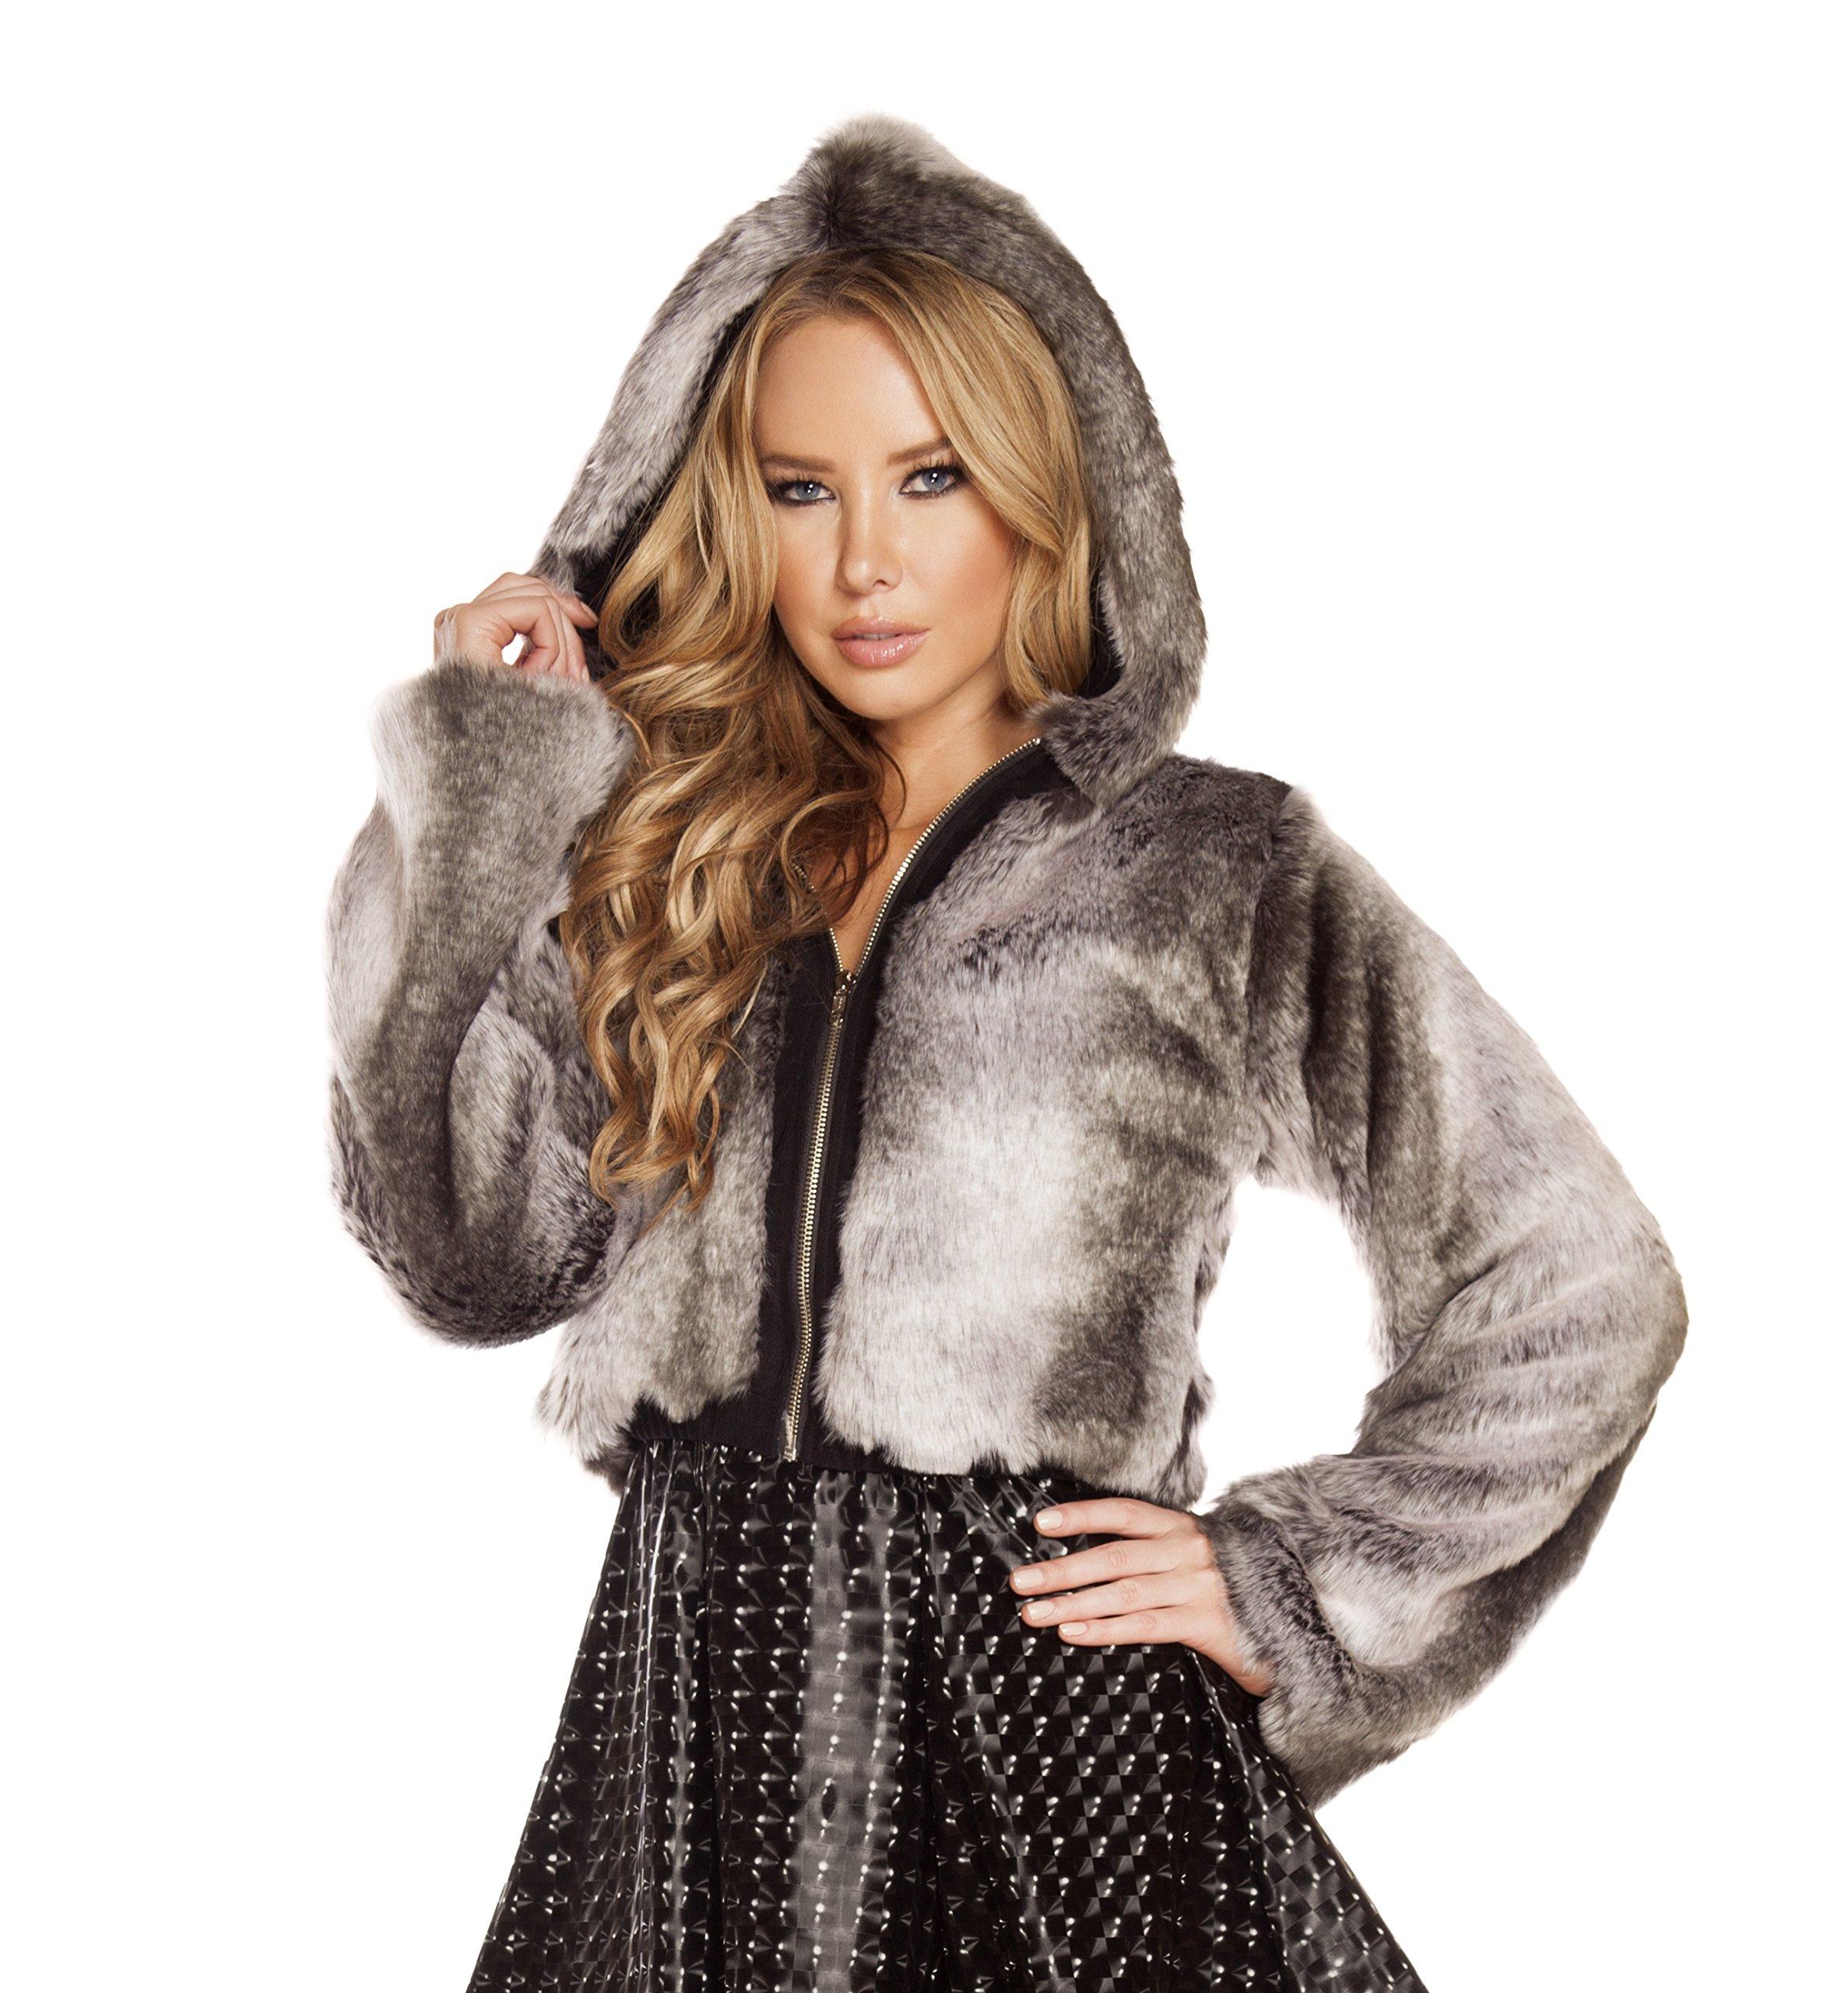 J. Valentine Women's Chinchilla Faux Fur Cropped Jacket, Grey, One Size by J. Valentine